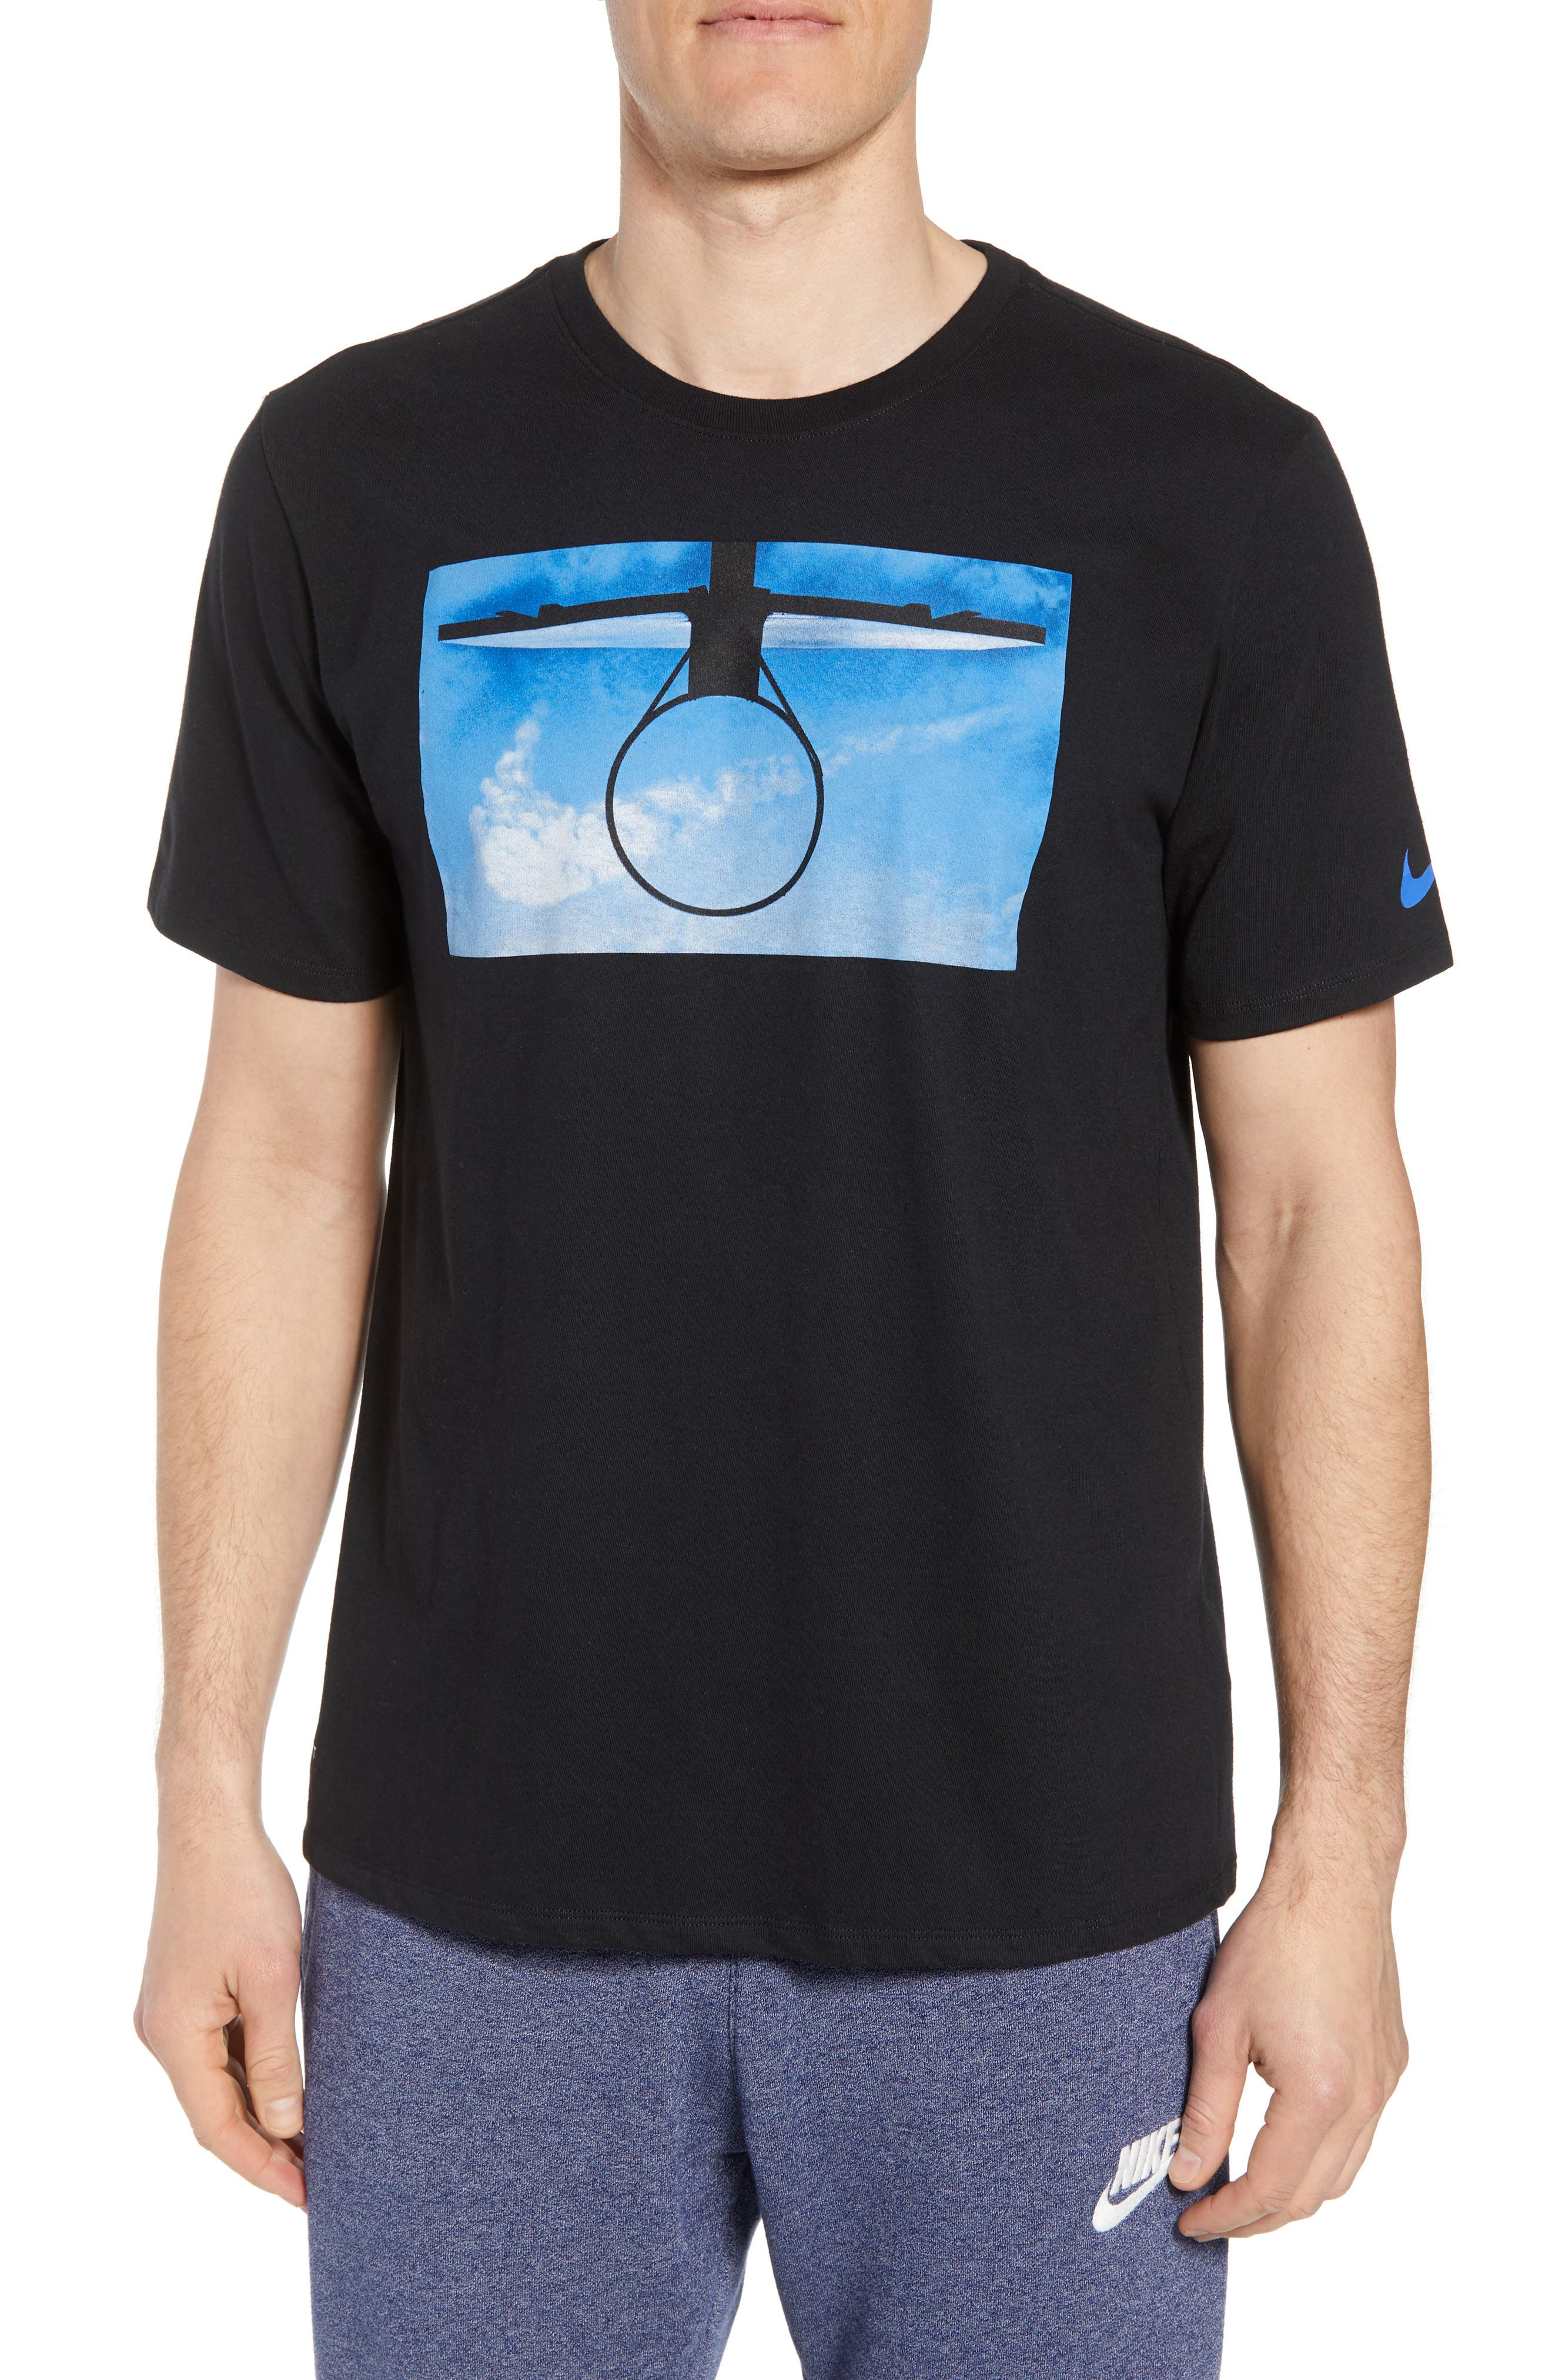 Nike Dri-Fit Basketball Daydream T-Shirt, Black